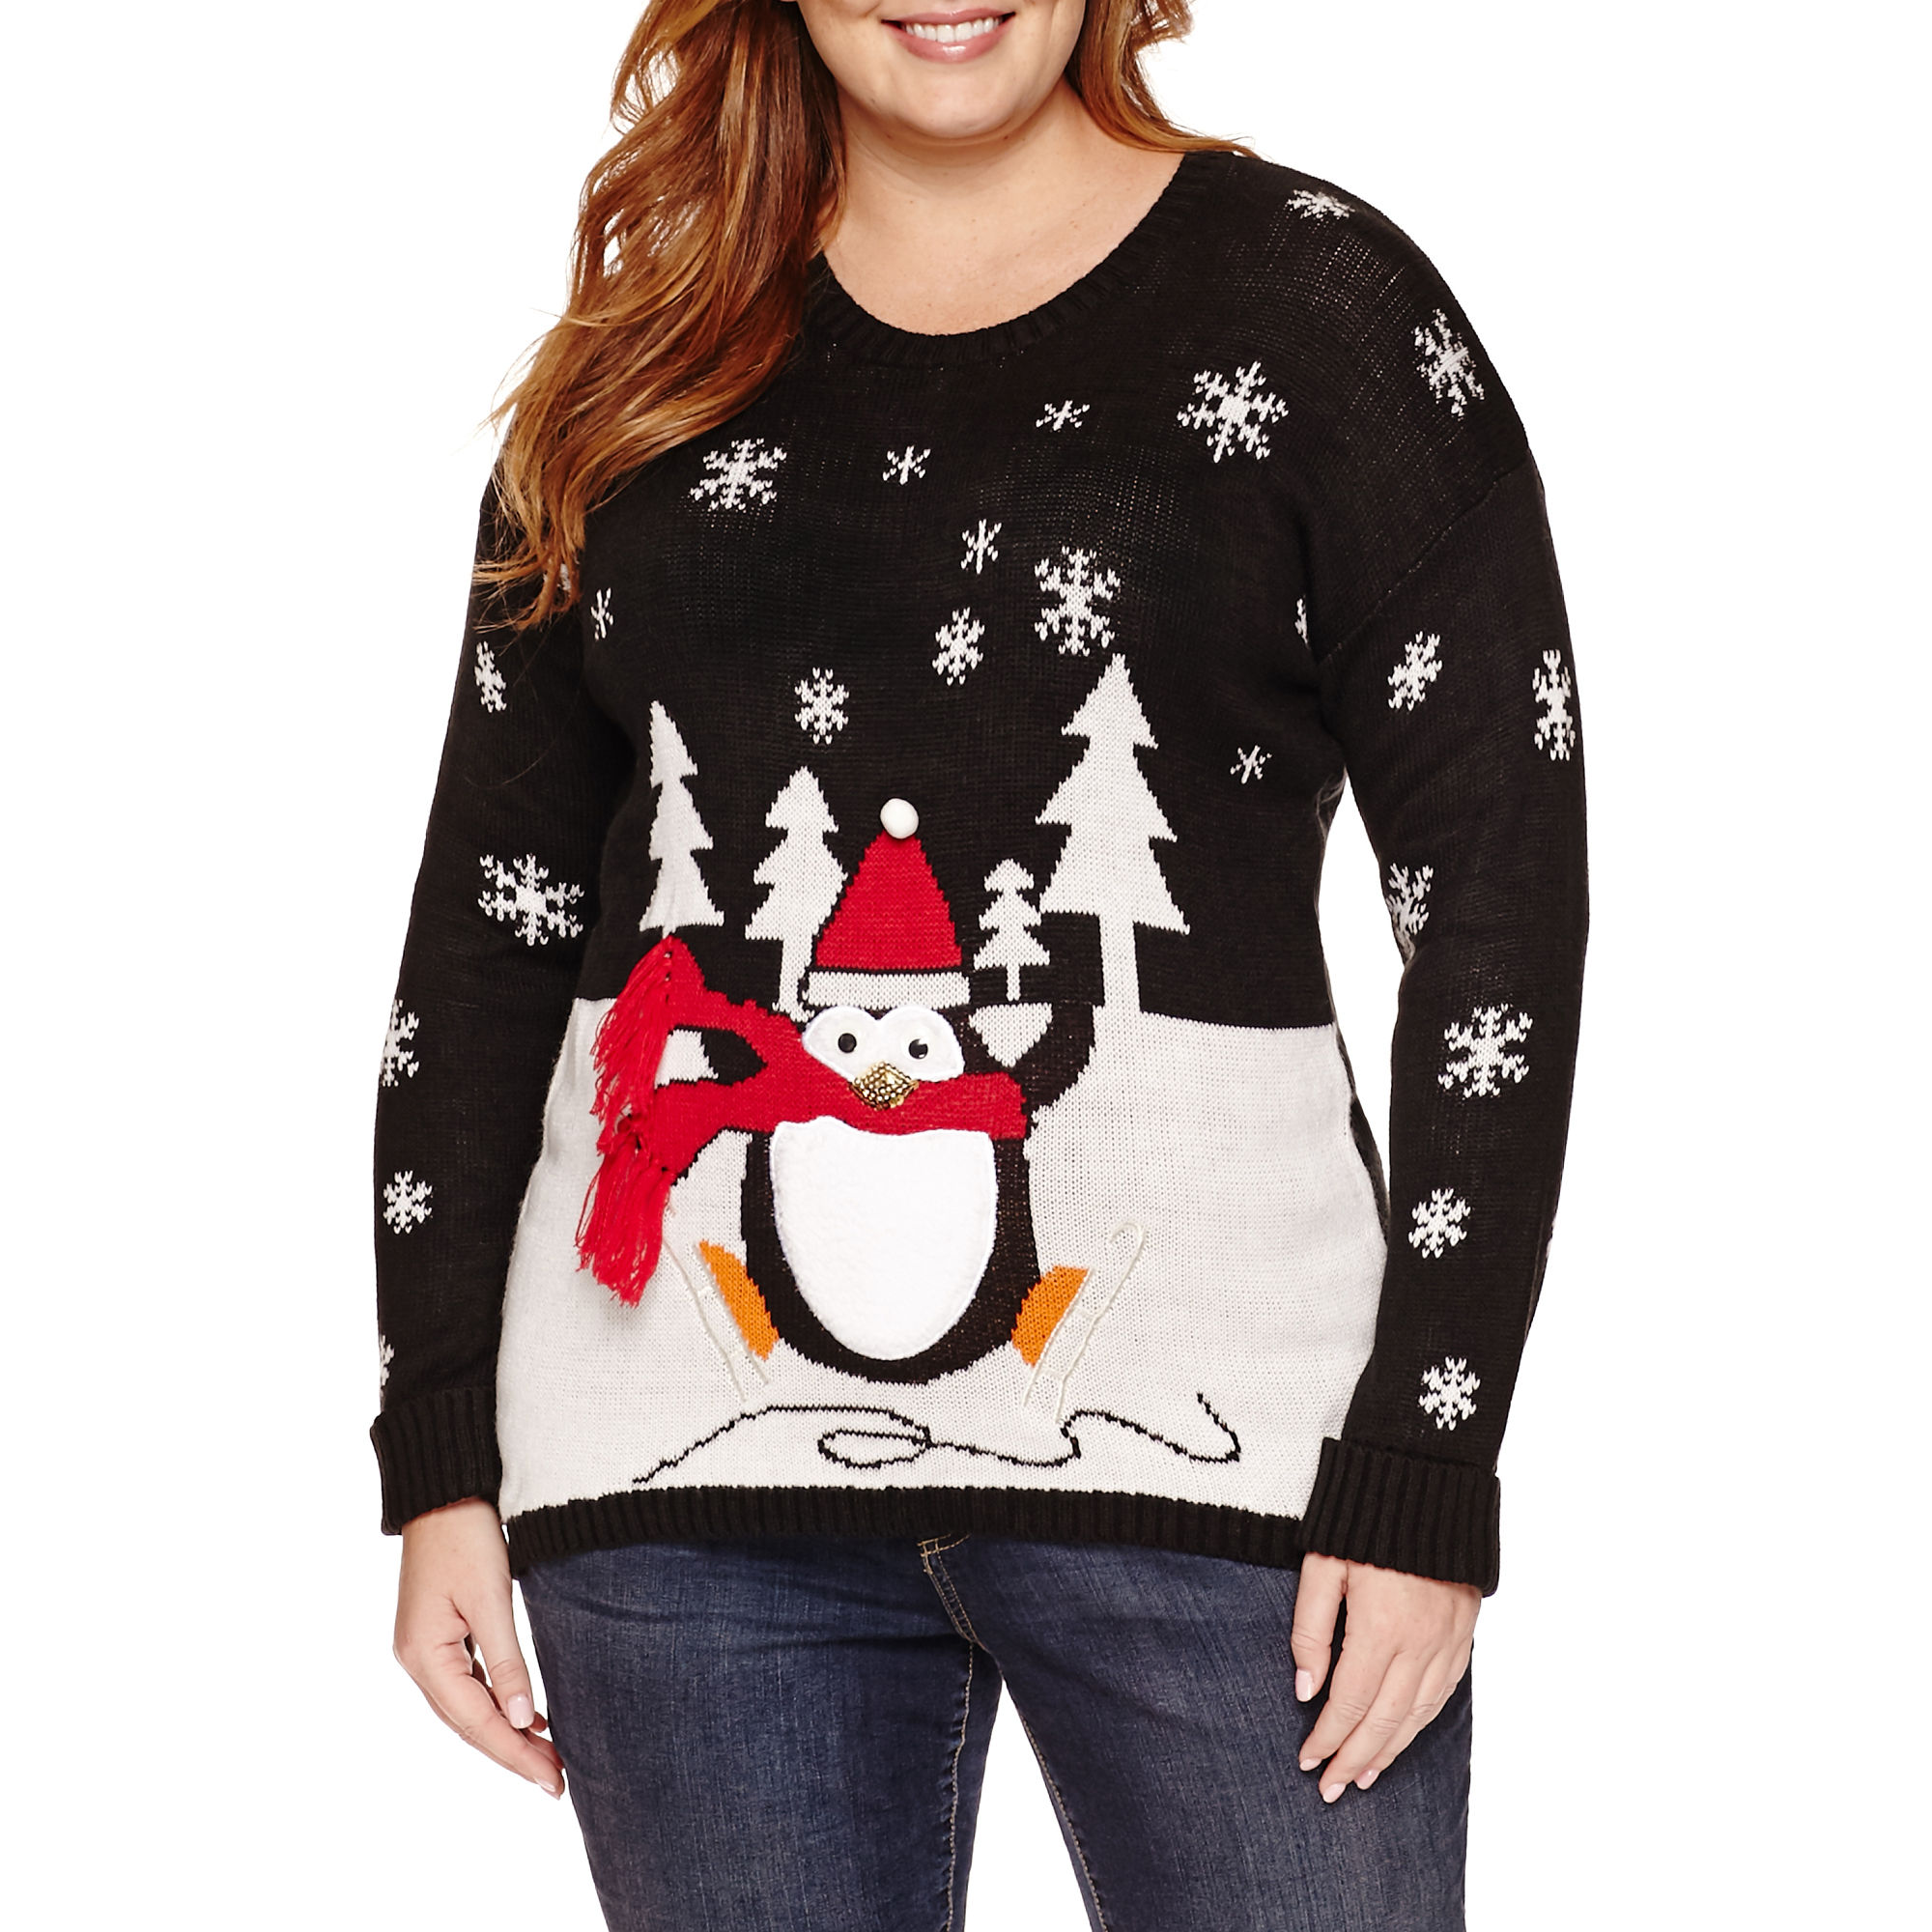 Tiara International Round Neck Knit Pullover Sweater - Plus